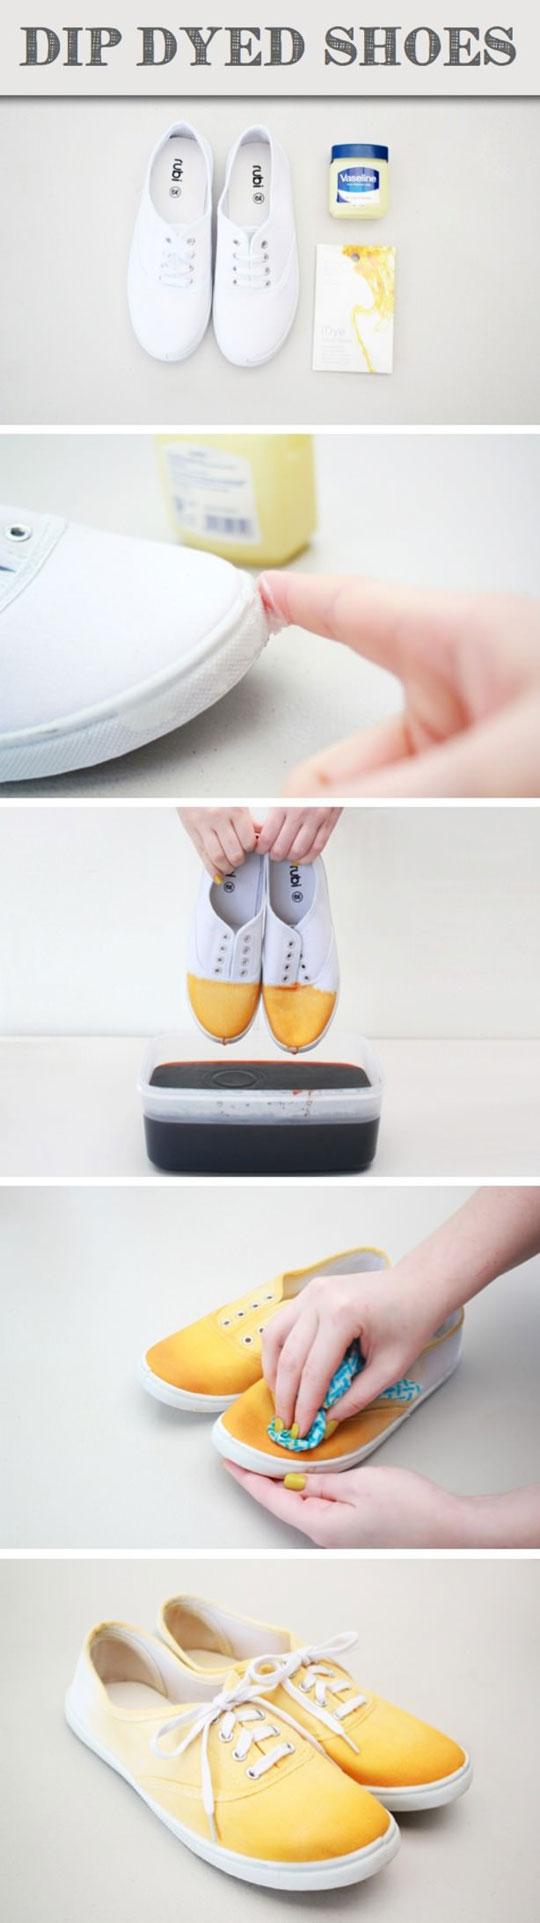 cool-DIY-dyed-shoes-vaseline